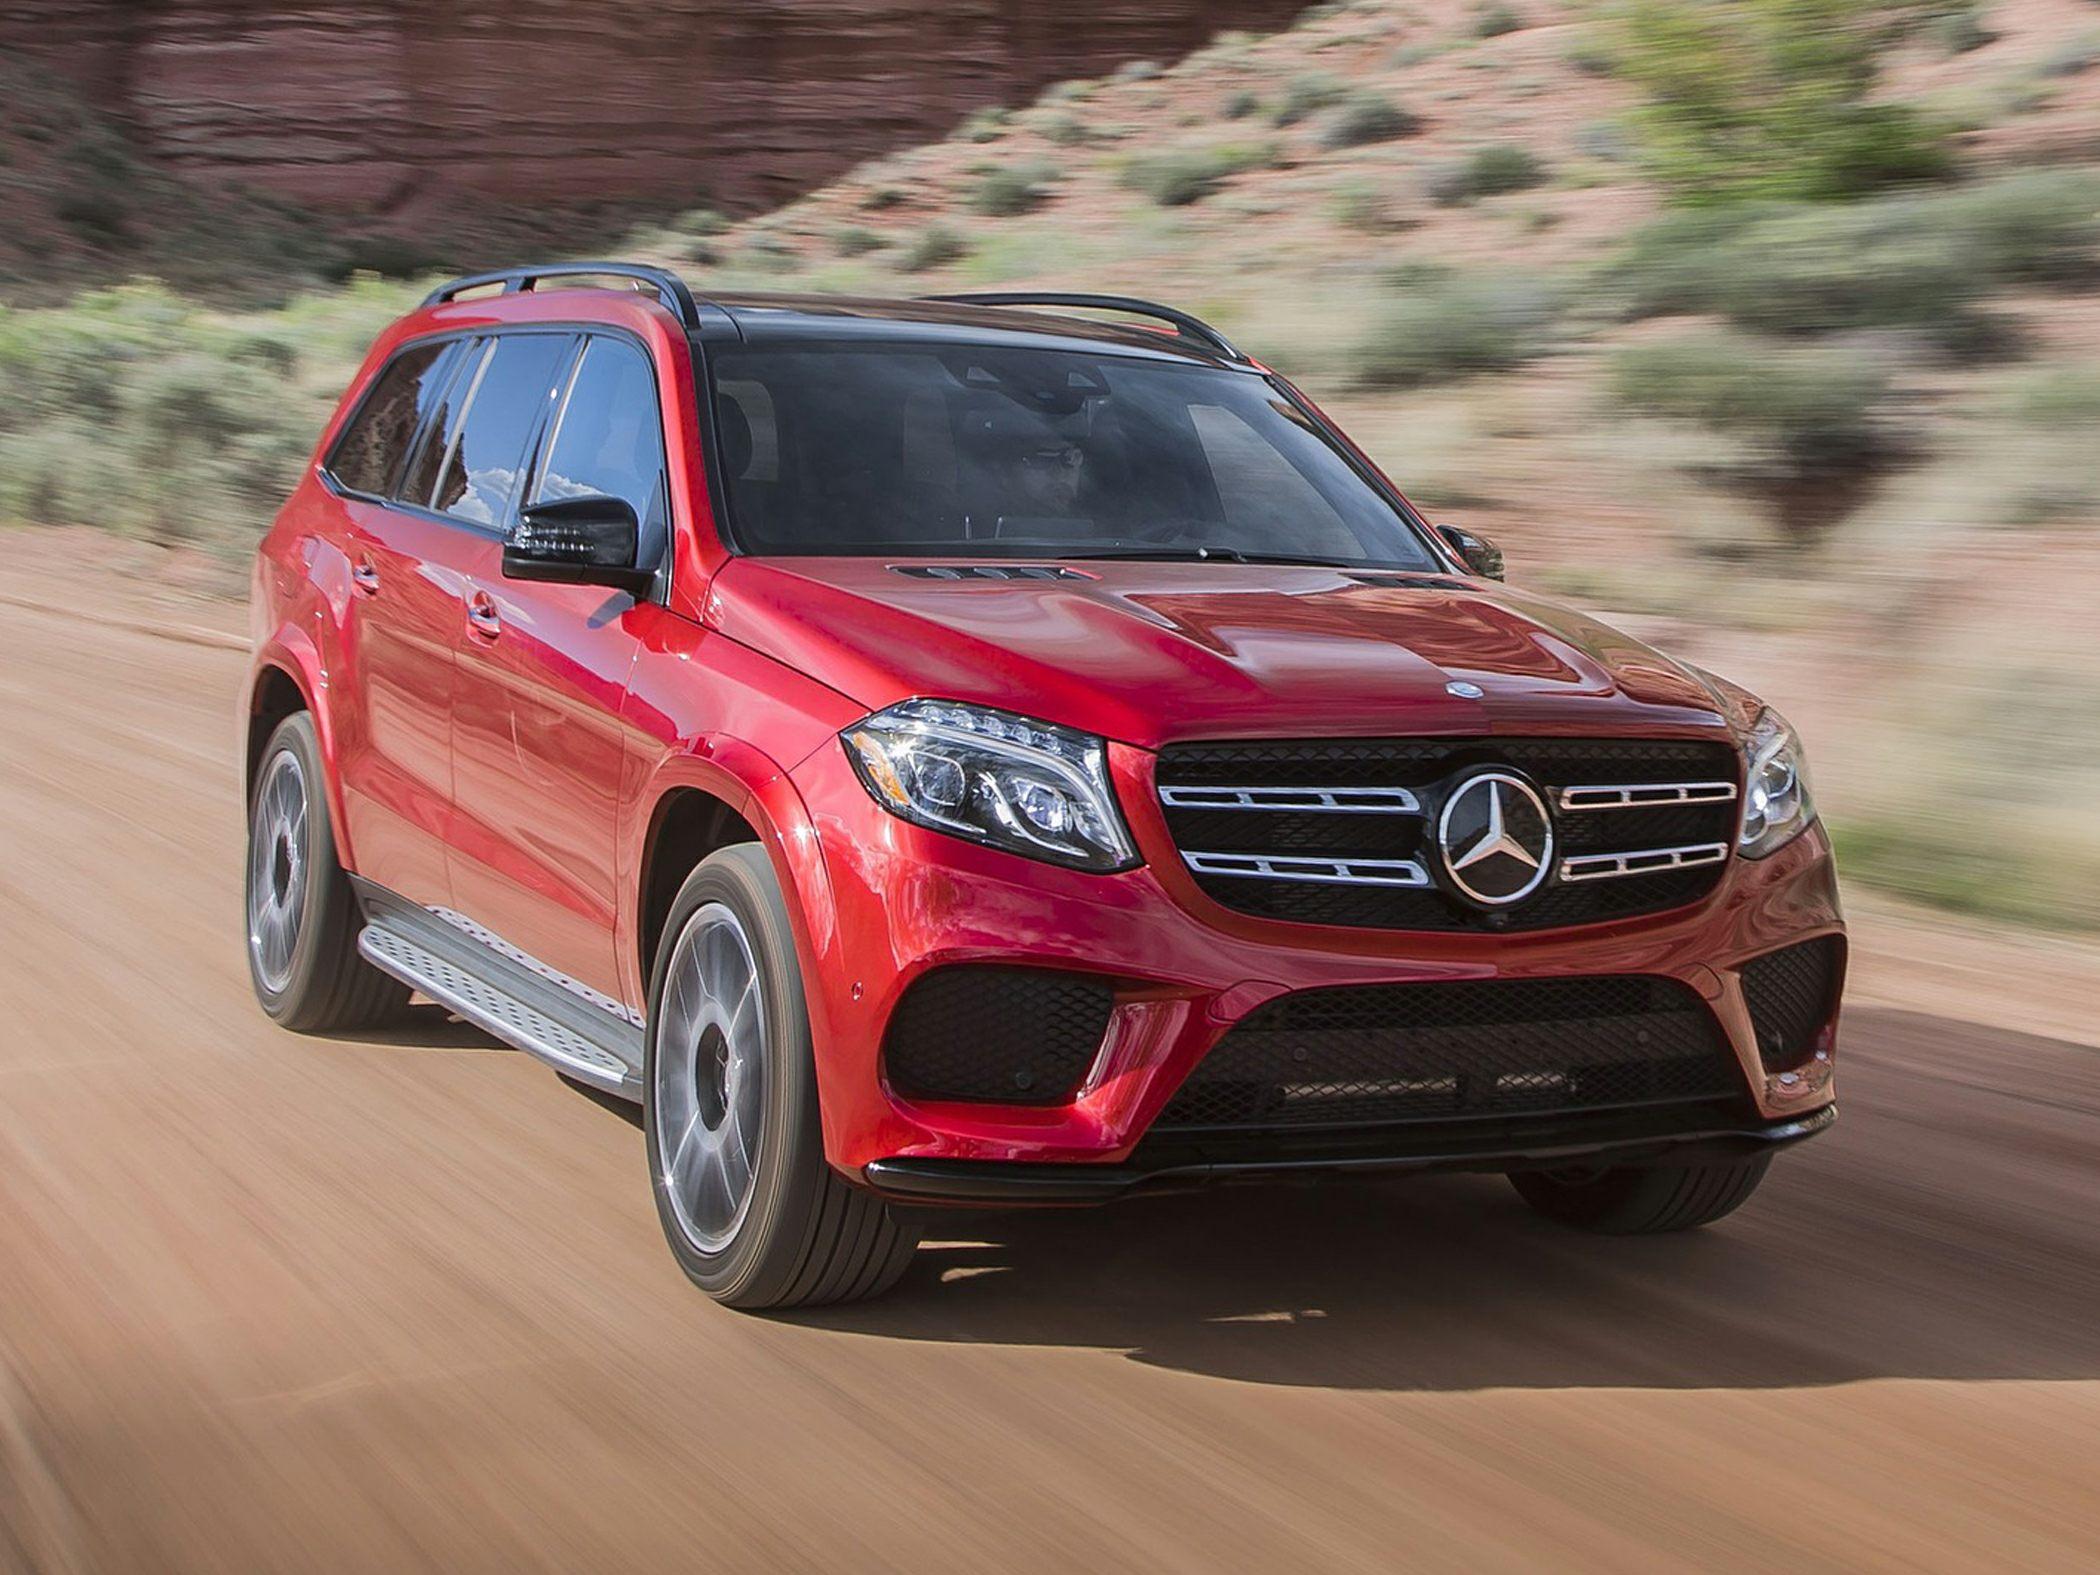 2018 mercedes benz gls class deals prices incentives for Mercedes benz incentives and rebates